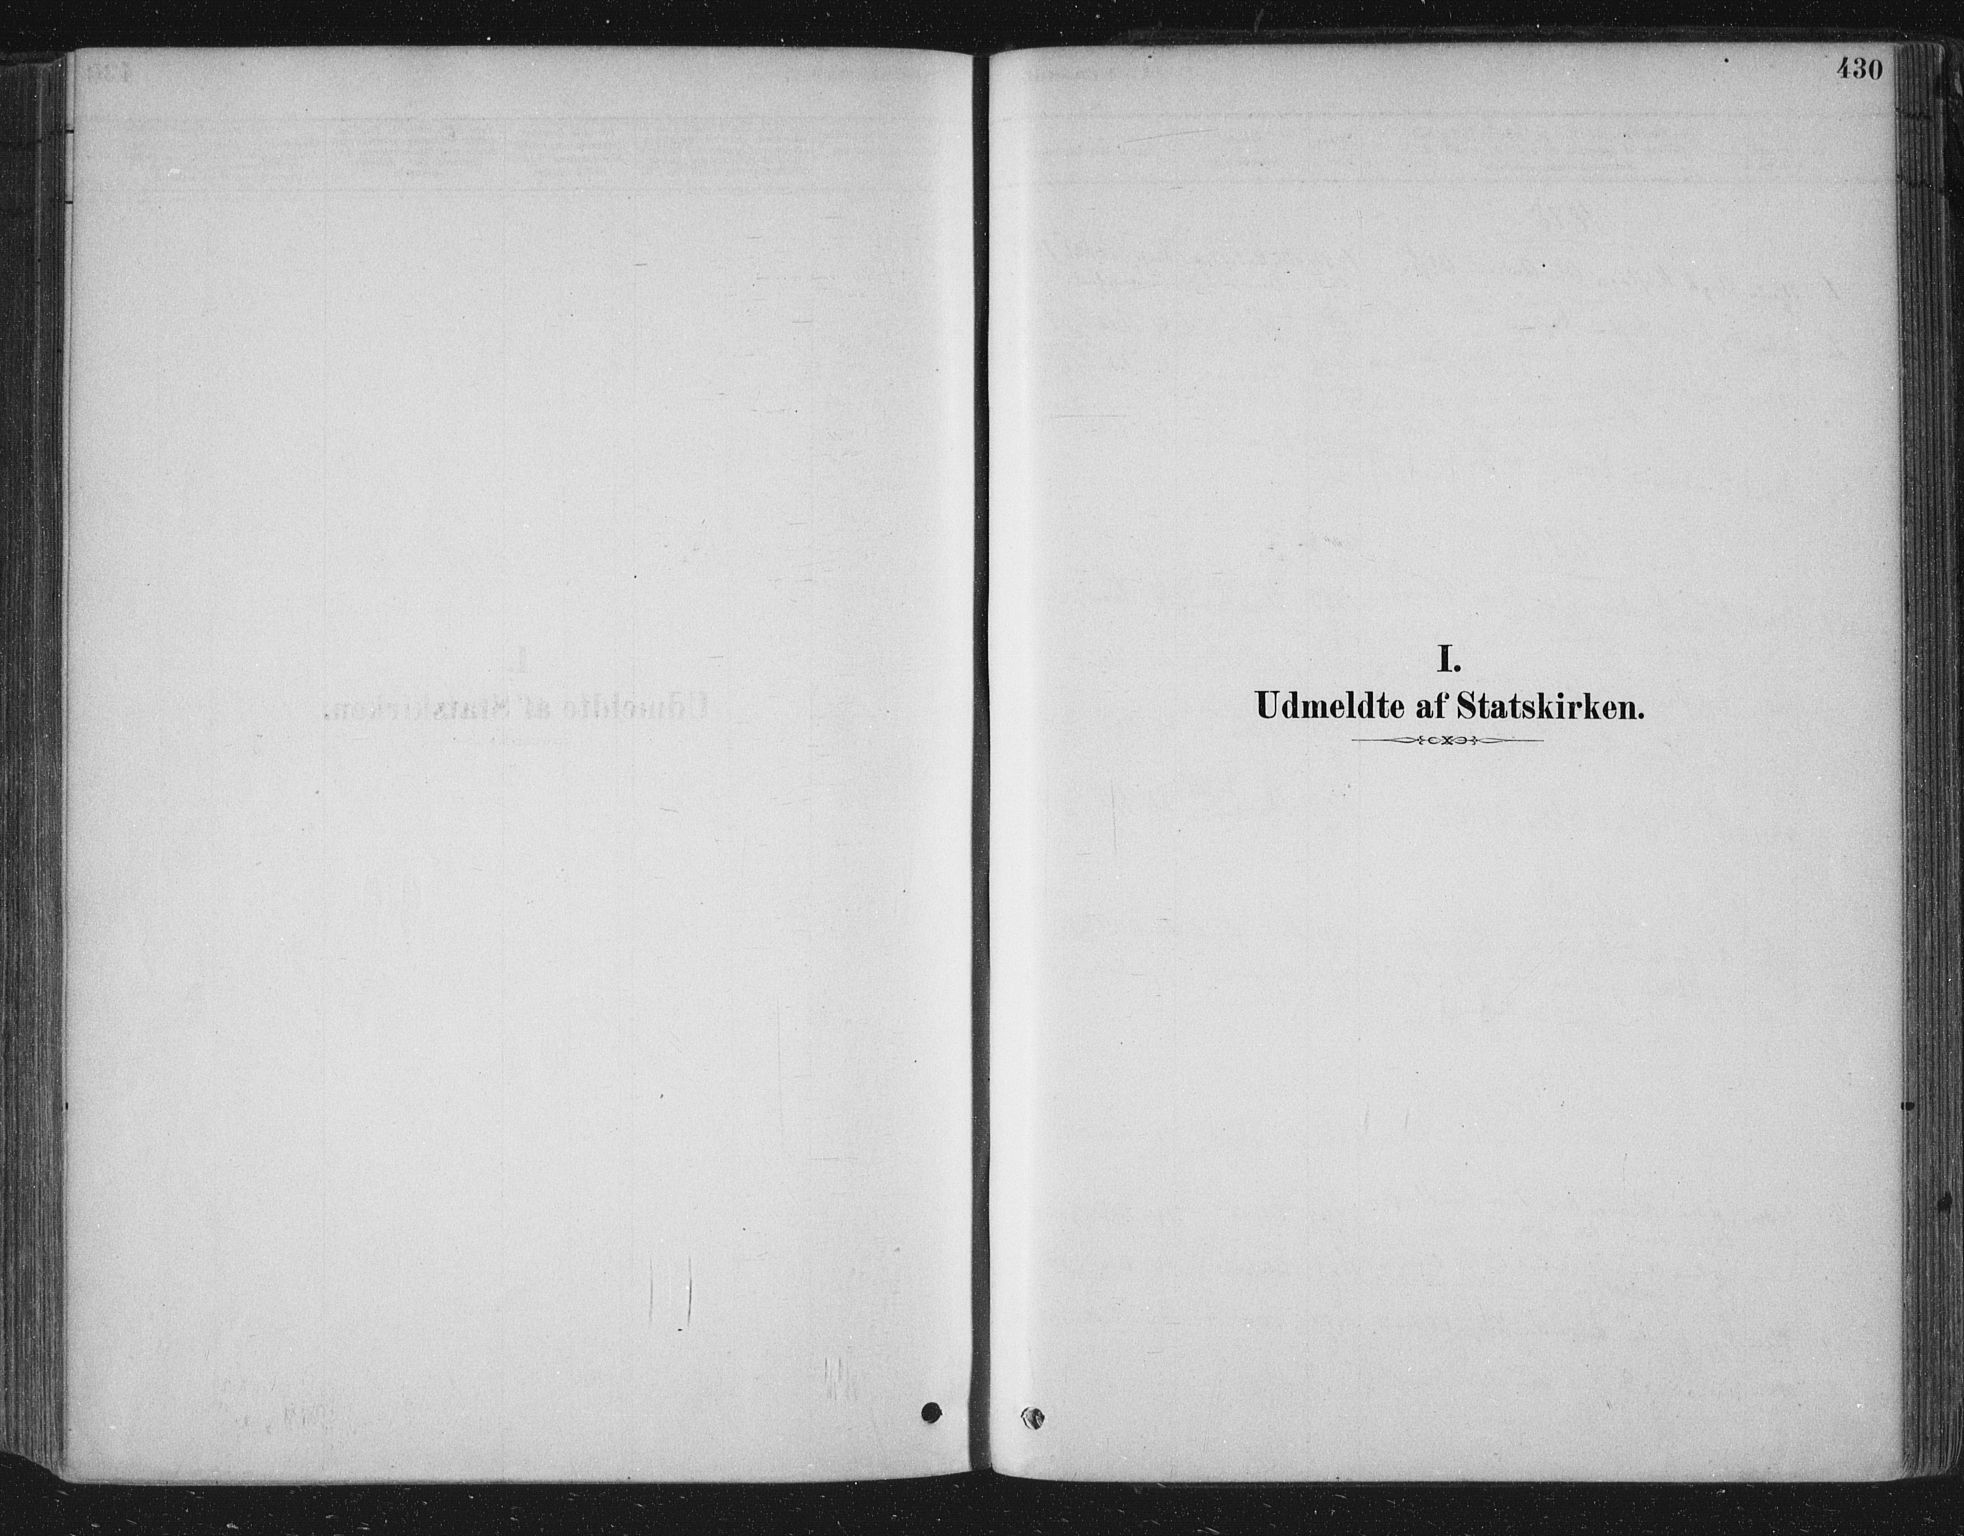 SAKO, Bamble kirkebøker, F/Fa/L0007: Ministerialbok nr. I 7, 1878-1888, s. 430